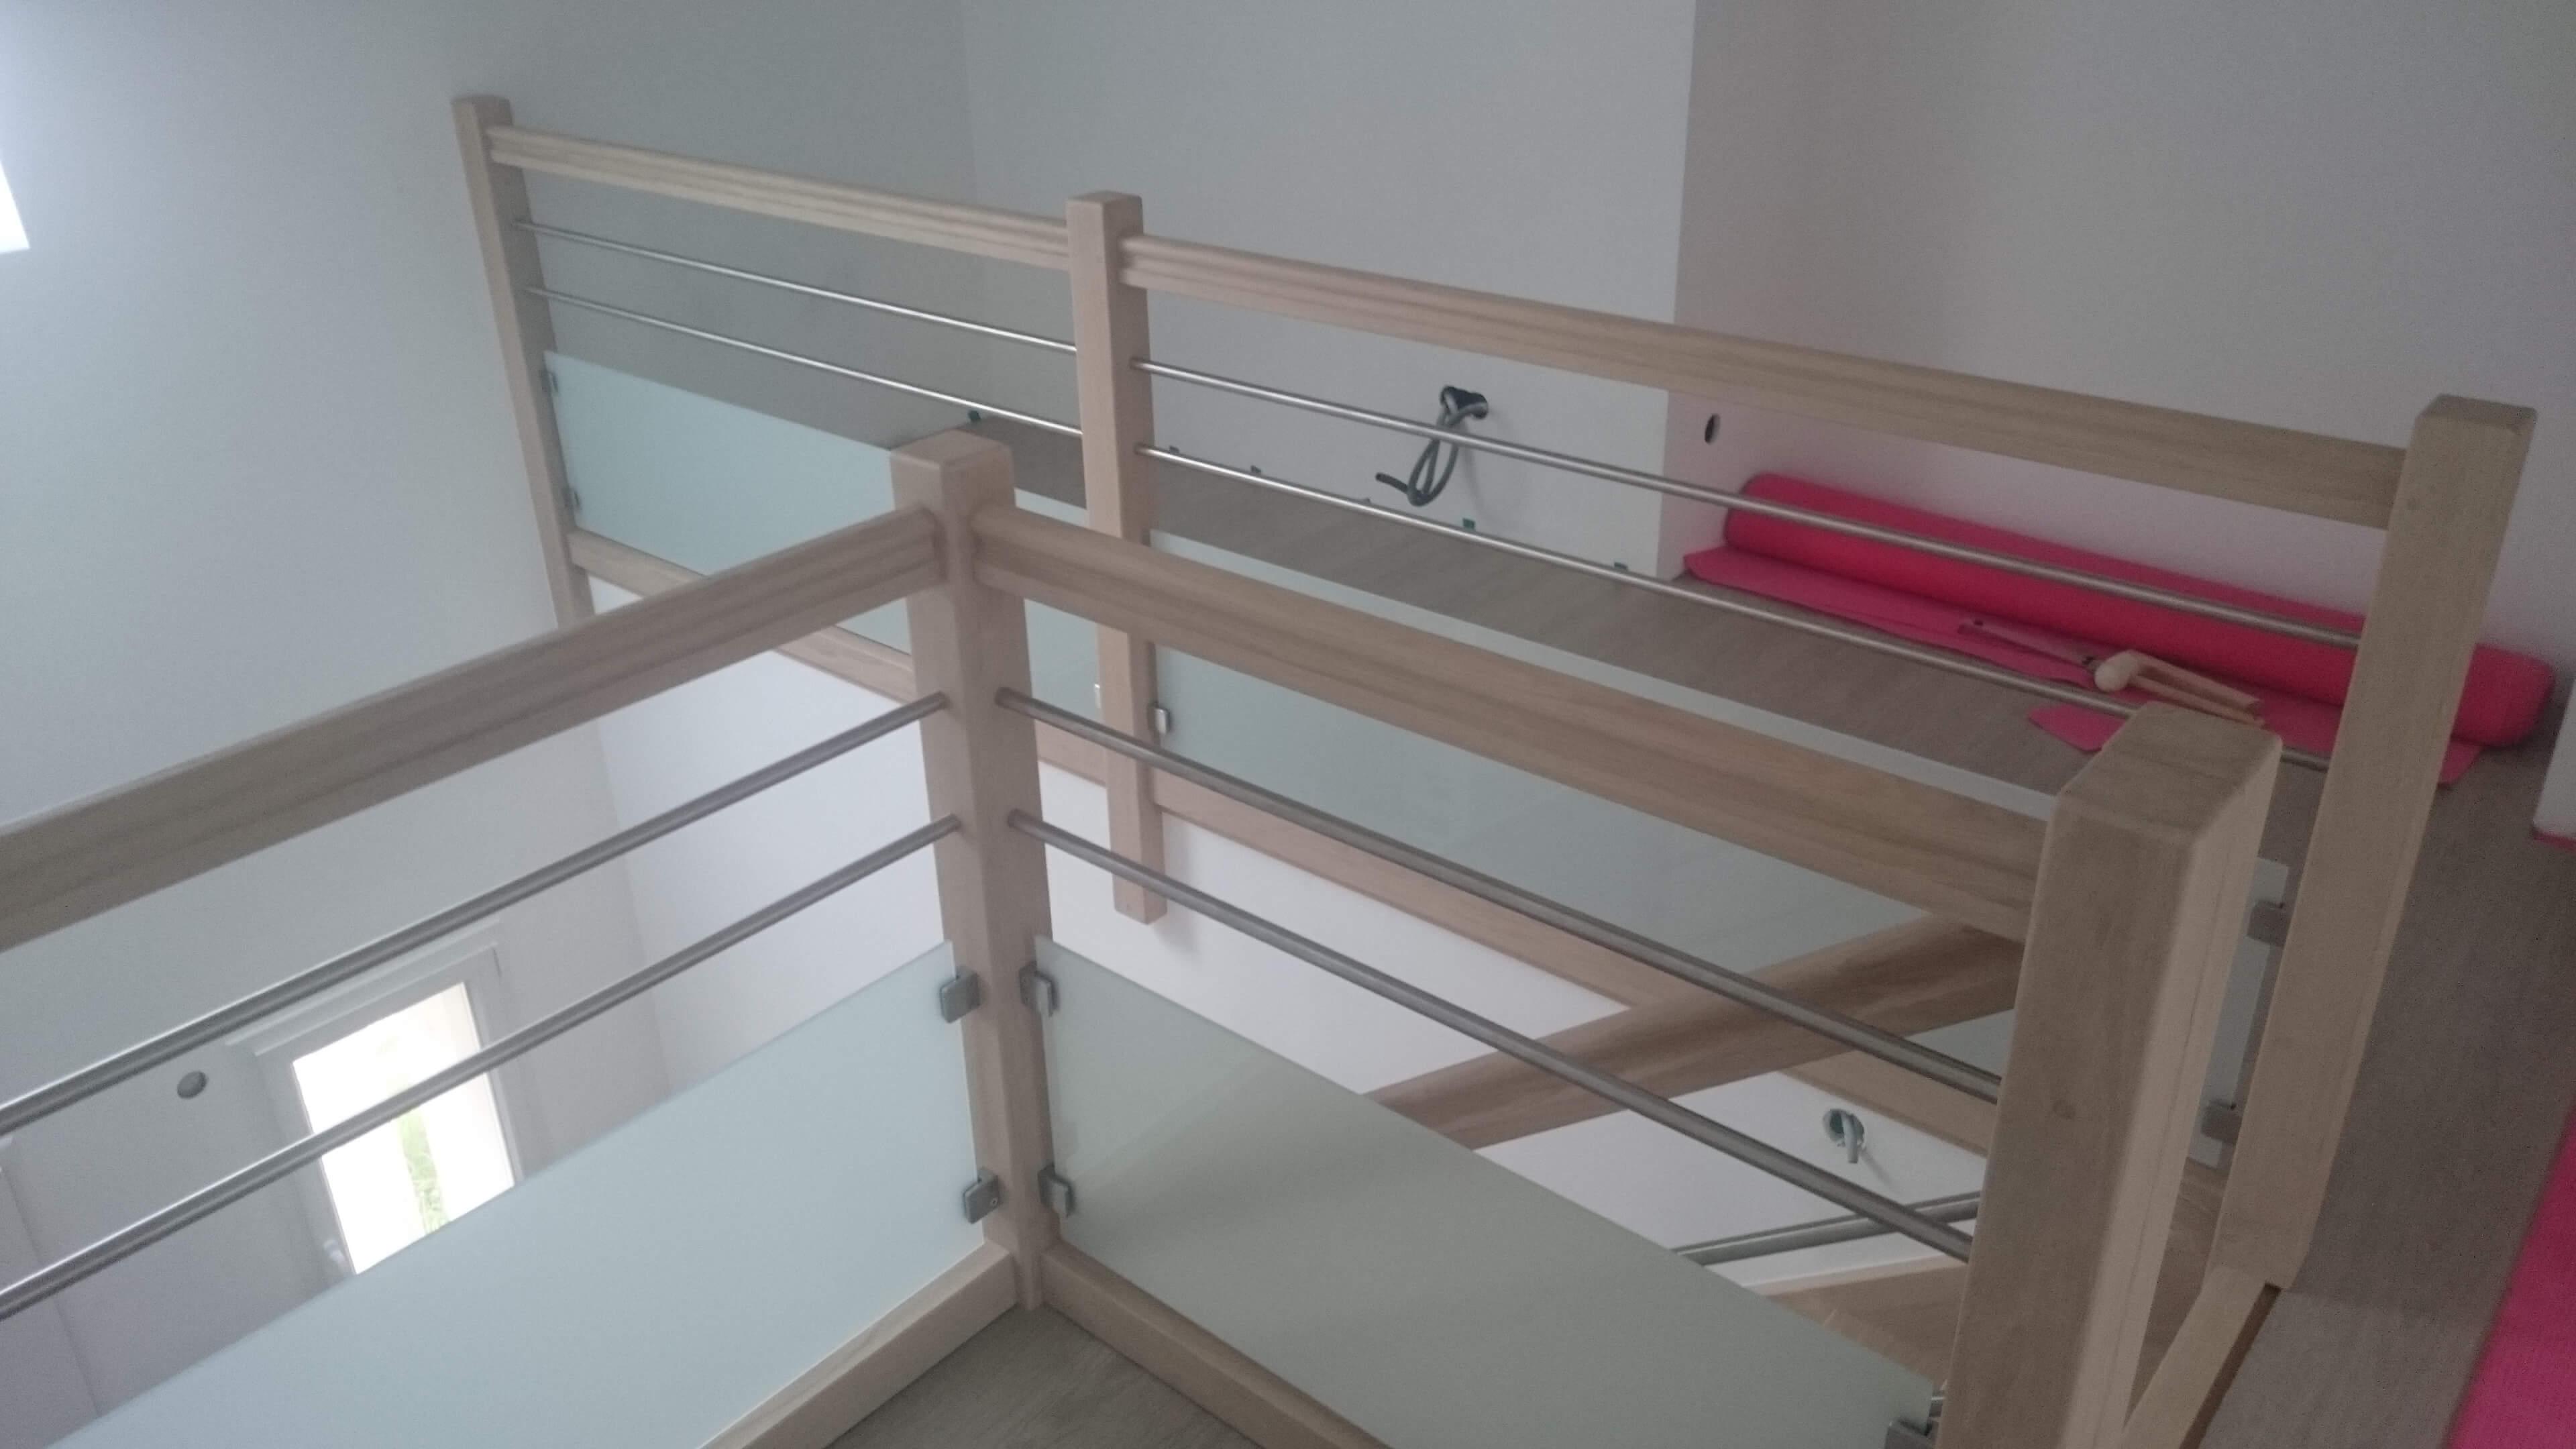 Menuiserie Figard - Fabrication sur mesure - Garde corps - Chêne blanchi inox verre opale - Vesoul